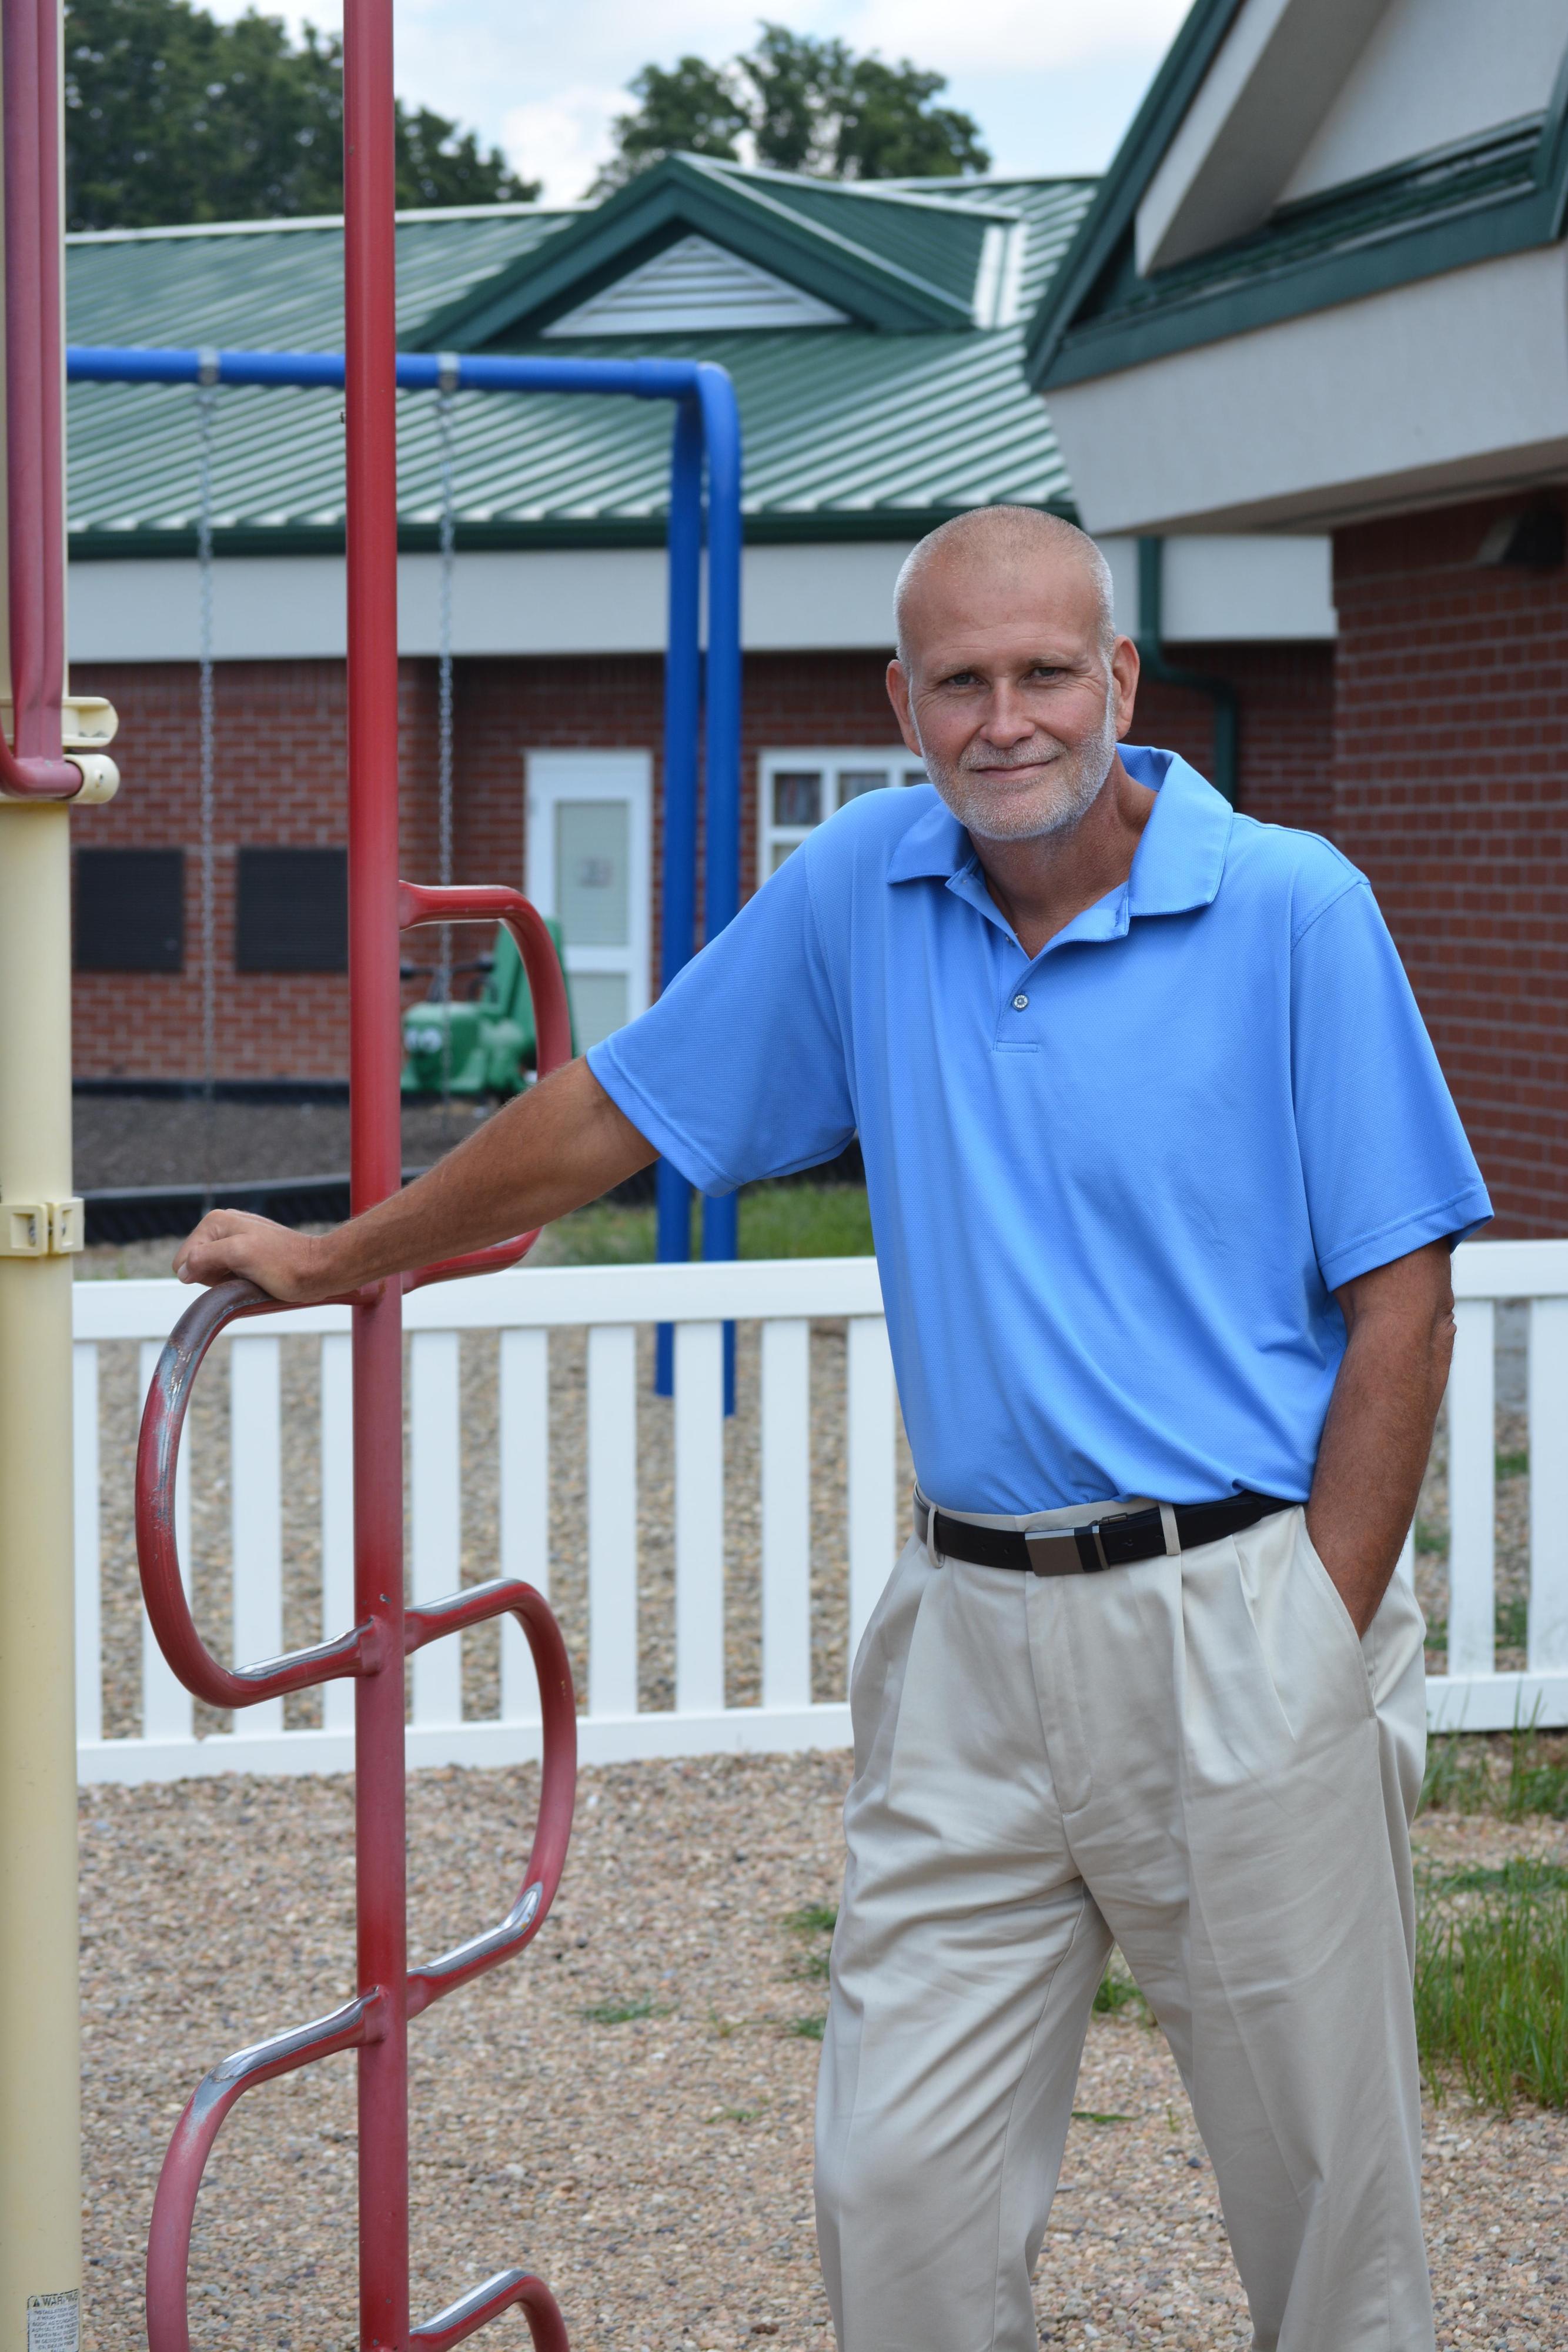 Assistant Principal Harris